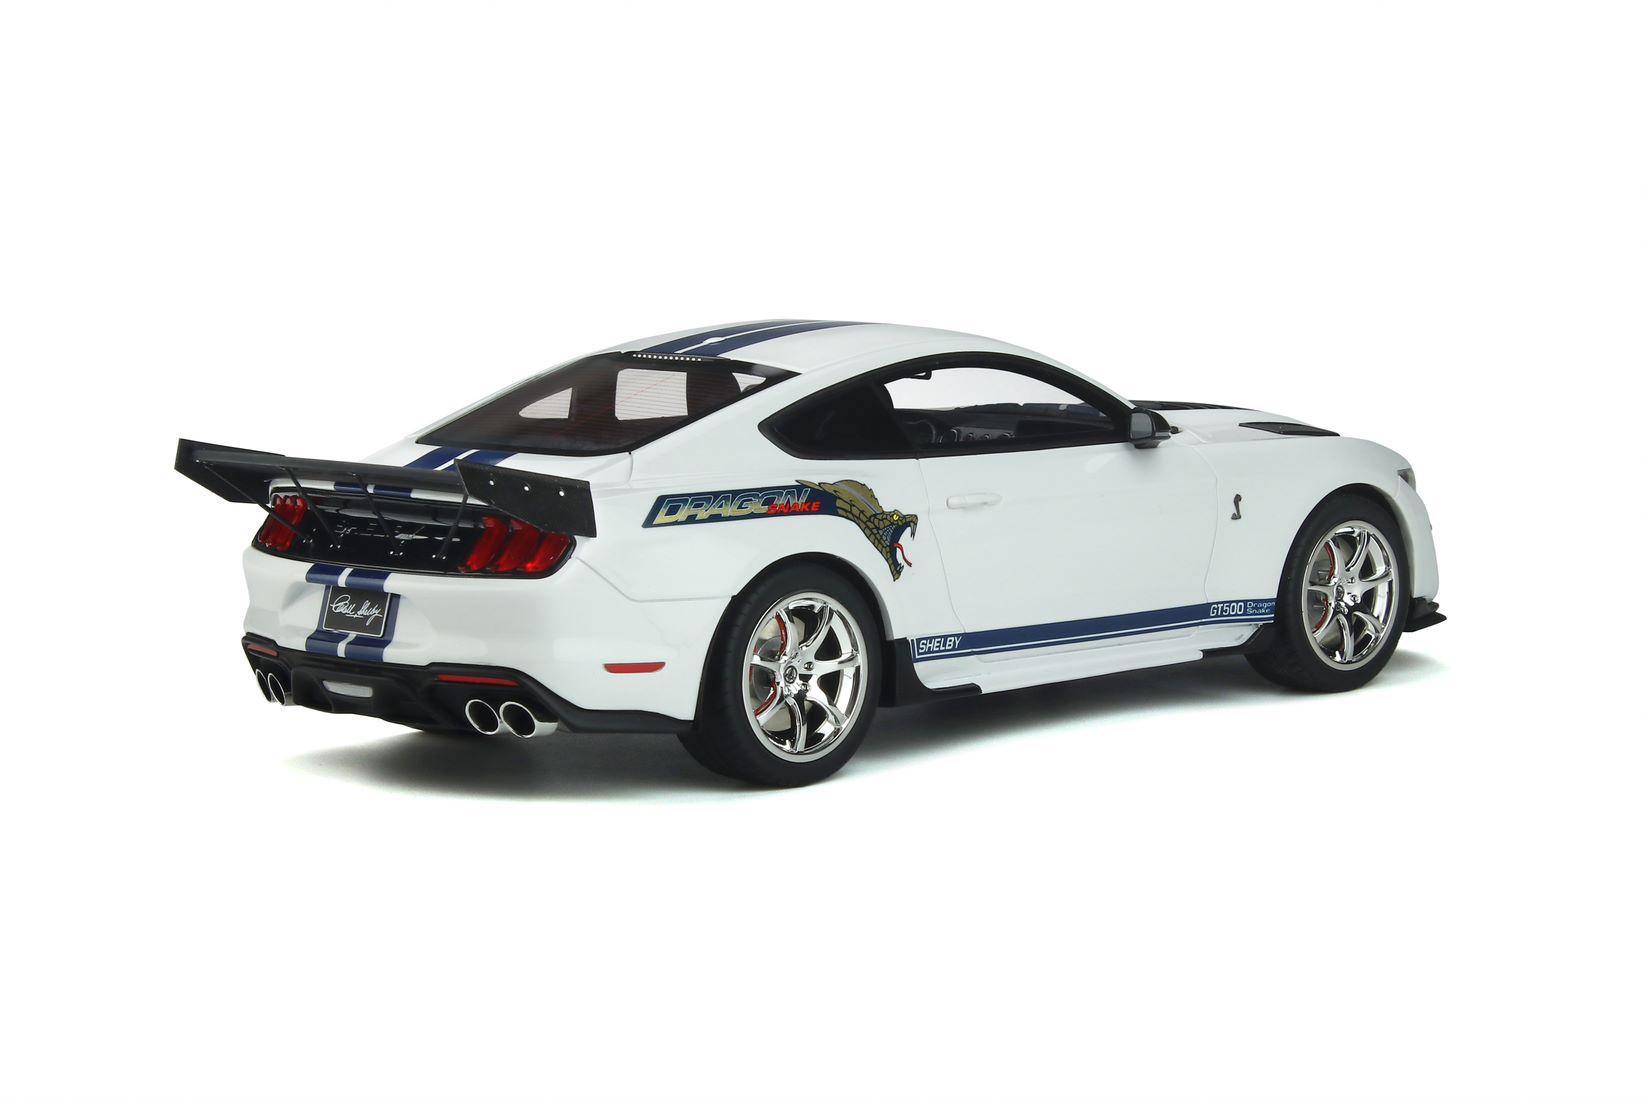 Shelby GT500 Dragon Snake Oxford White